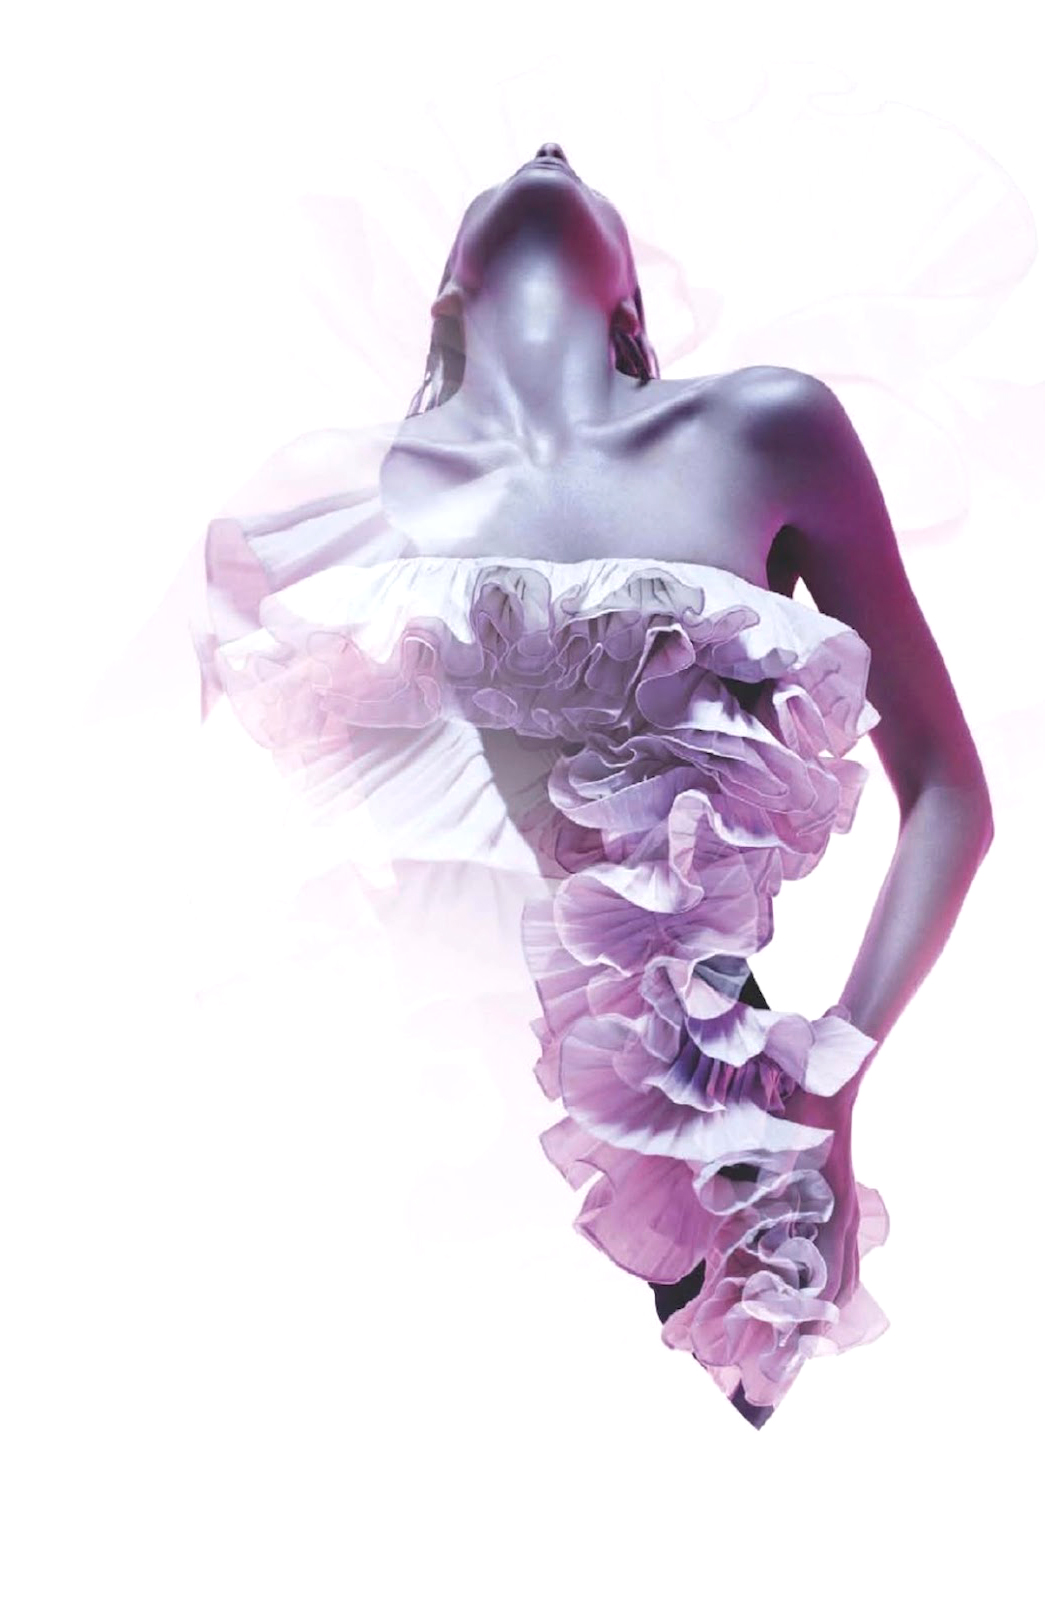 nne Vyalitsyna in Fantasie editorial, Numero #135 August 2012 (photography: Warren Du Preez & Nick Thornton Jones, styling: Franck Stambro)